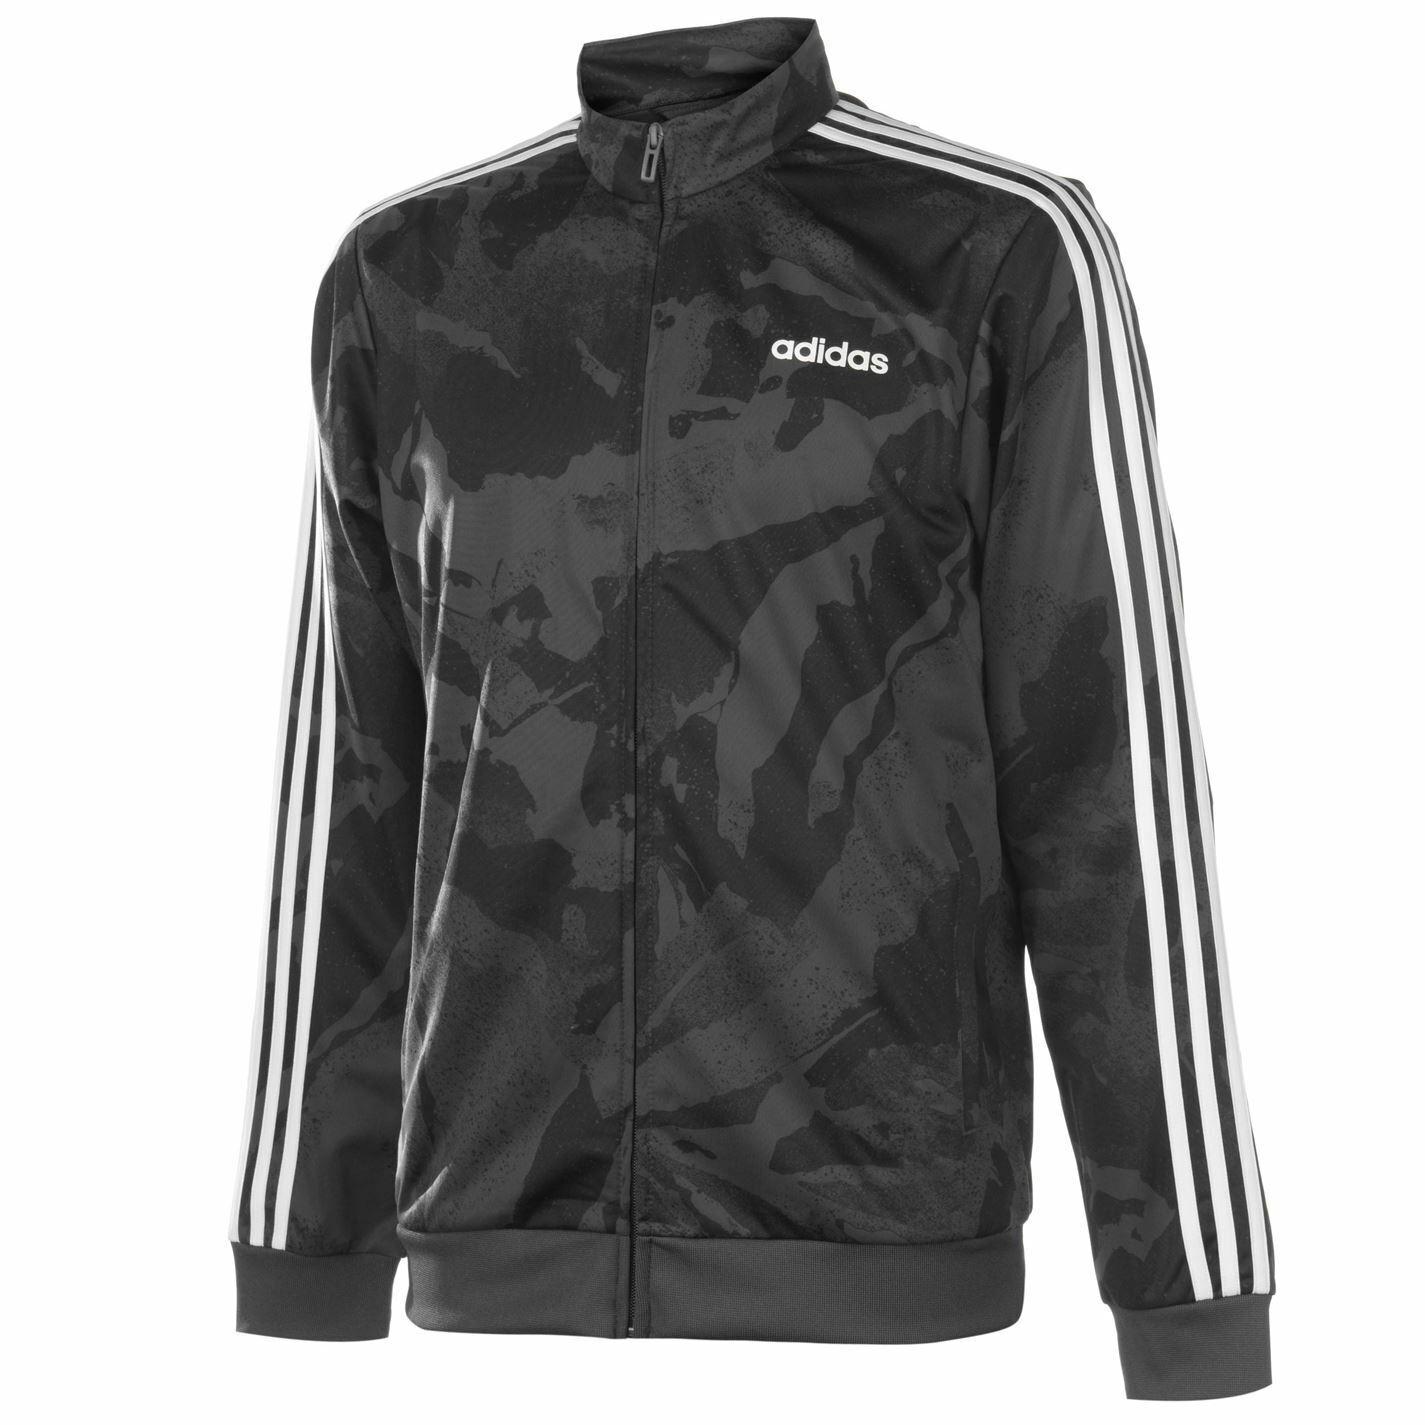 Adidas para hombre 3S camotracktop  92 Chándal Top  Garantía 100% de ajuste